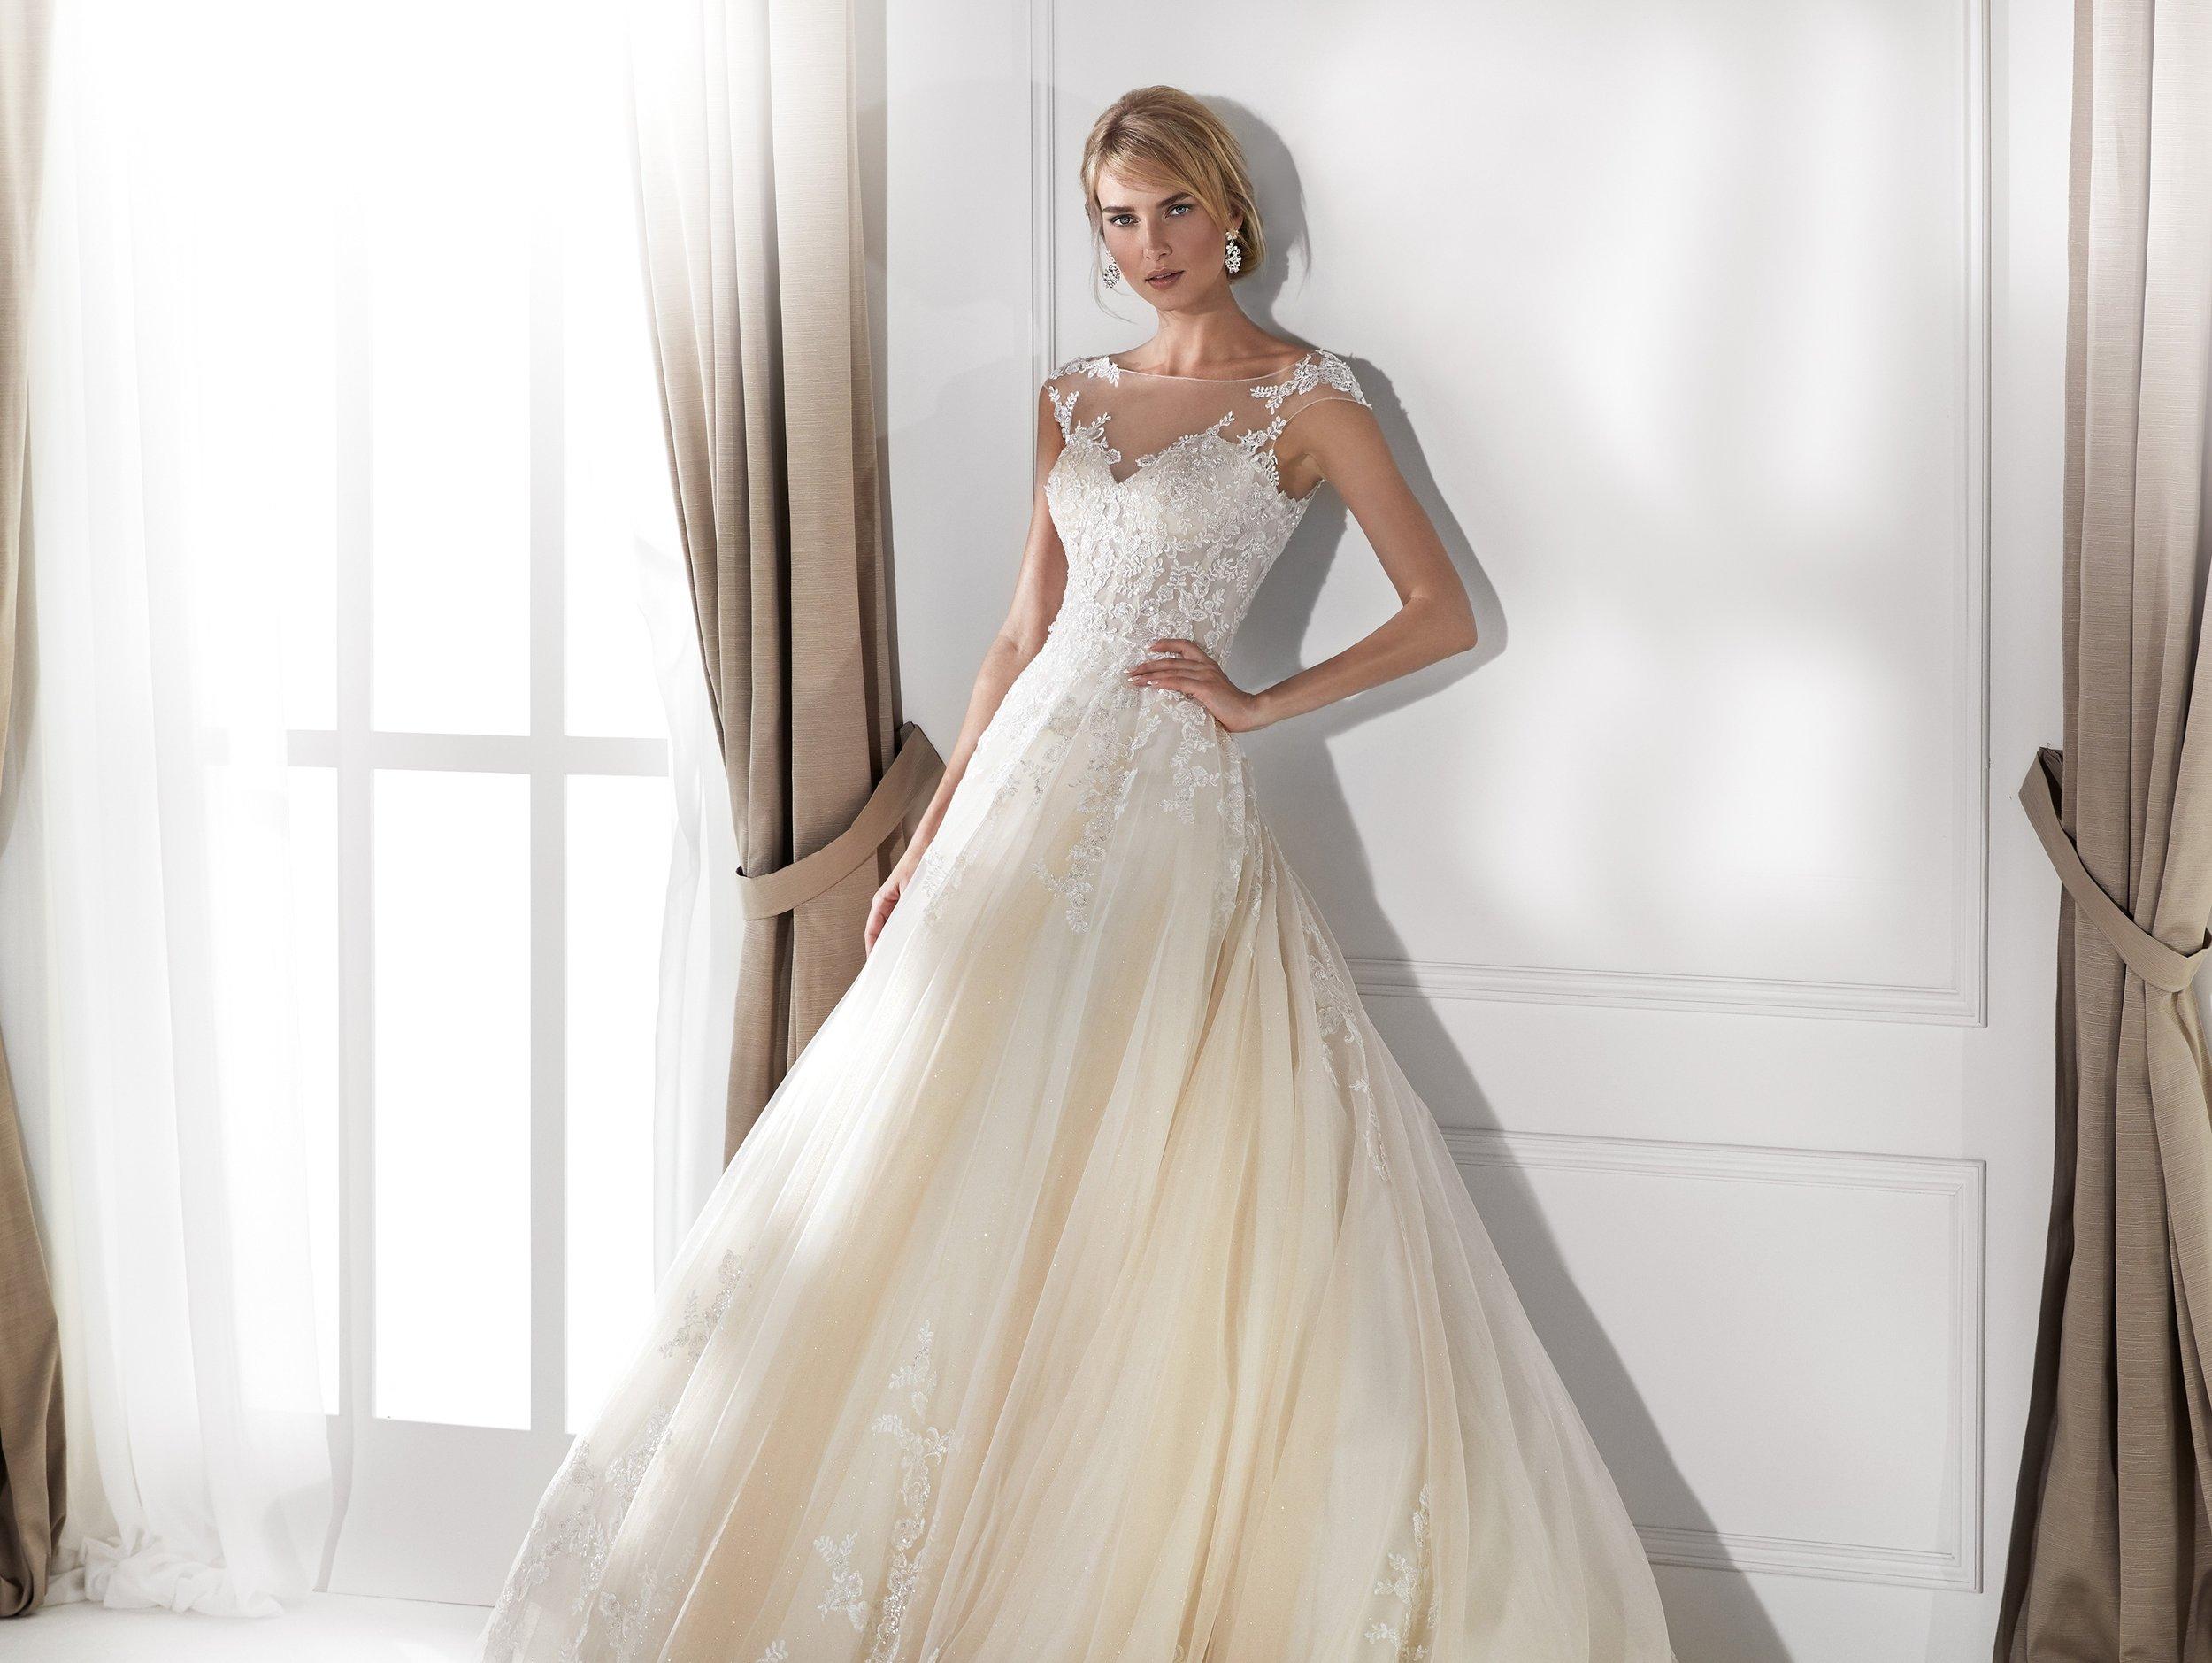 nicole-spose-NIA20821-Nicole-moda-sposa-2020-50.jpg